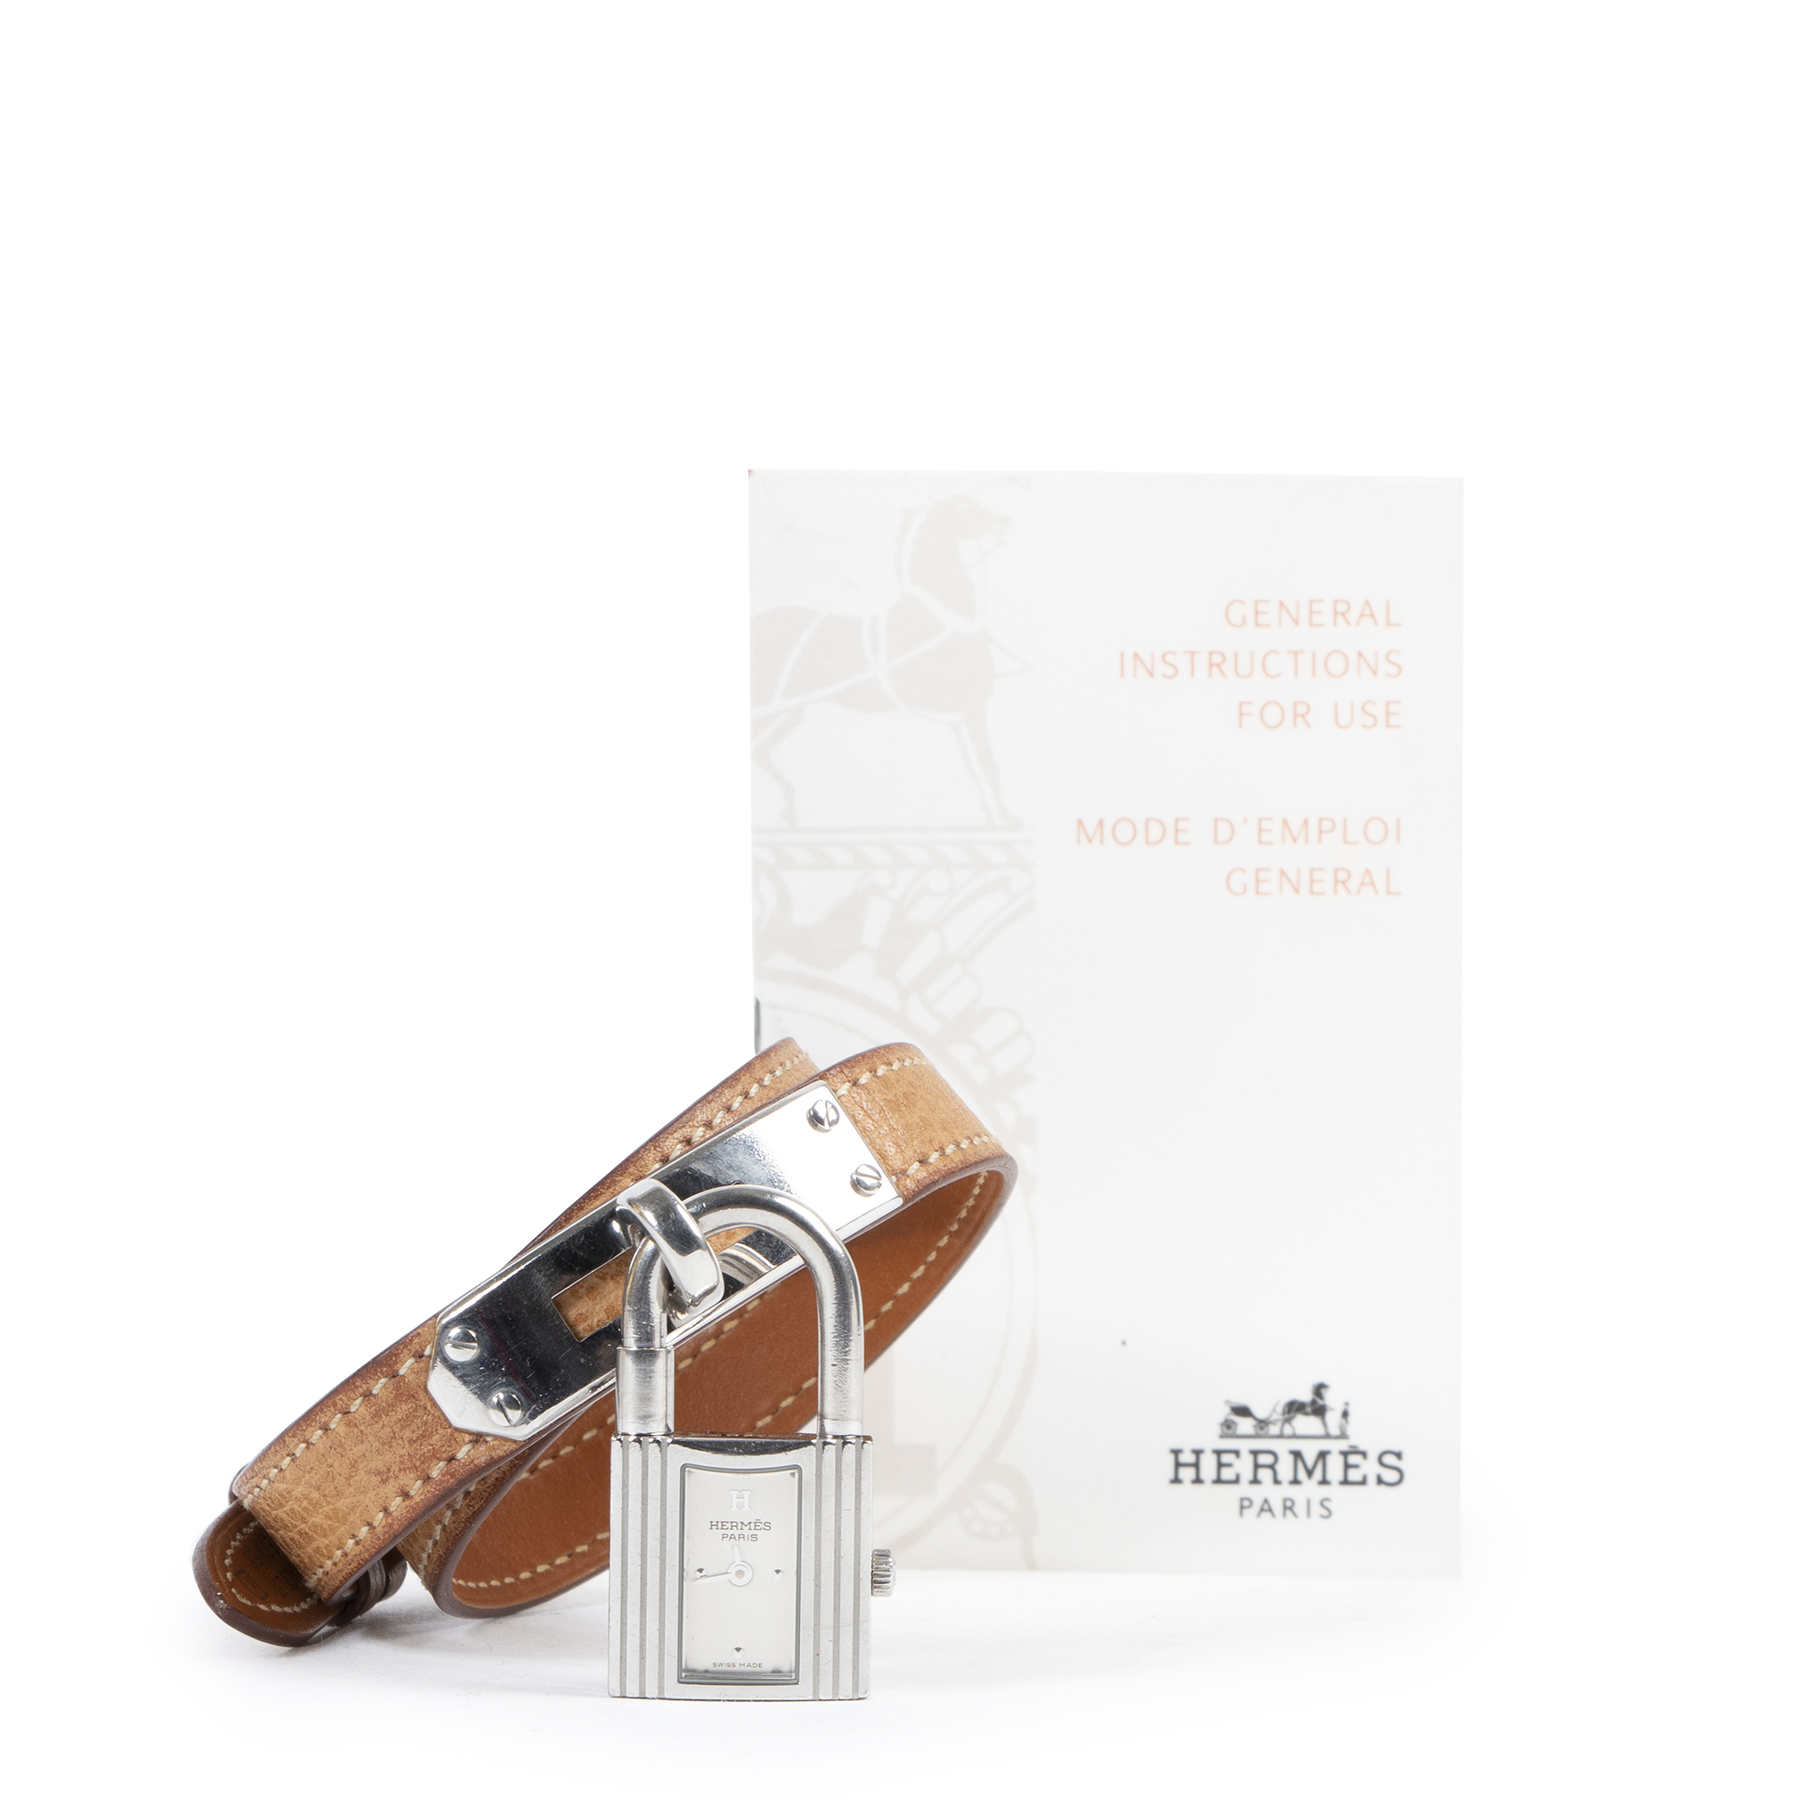 Authentieke Tweedehands Hermès Kelly Silver Watch - Size Large juiste prijs veilig online shoppen luxe merken webshop winkelen Antwerpen België mode fashion